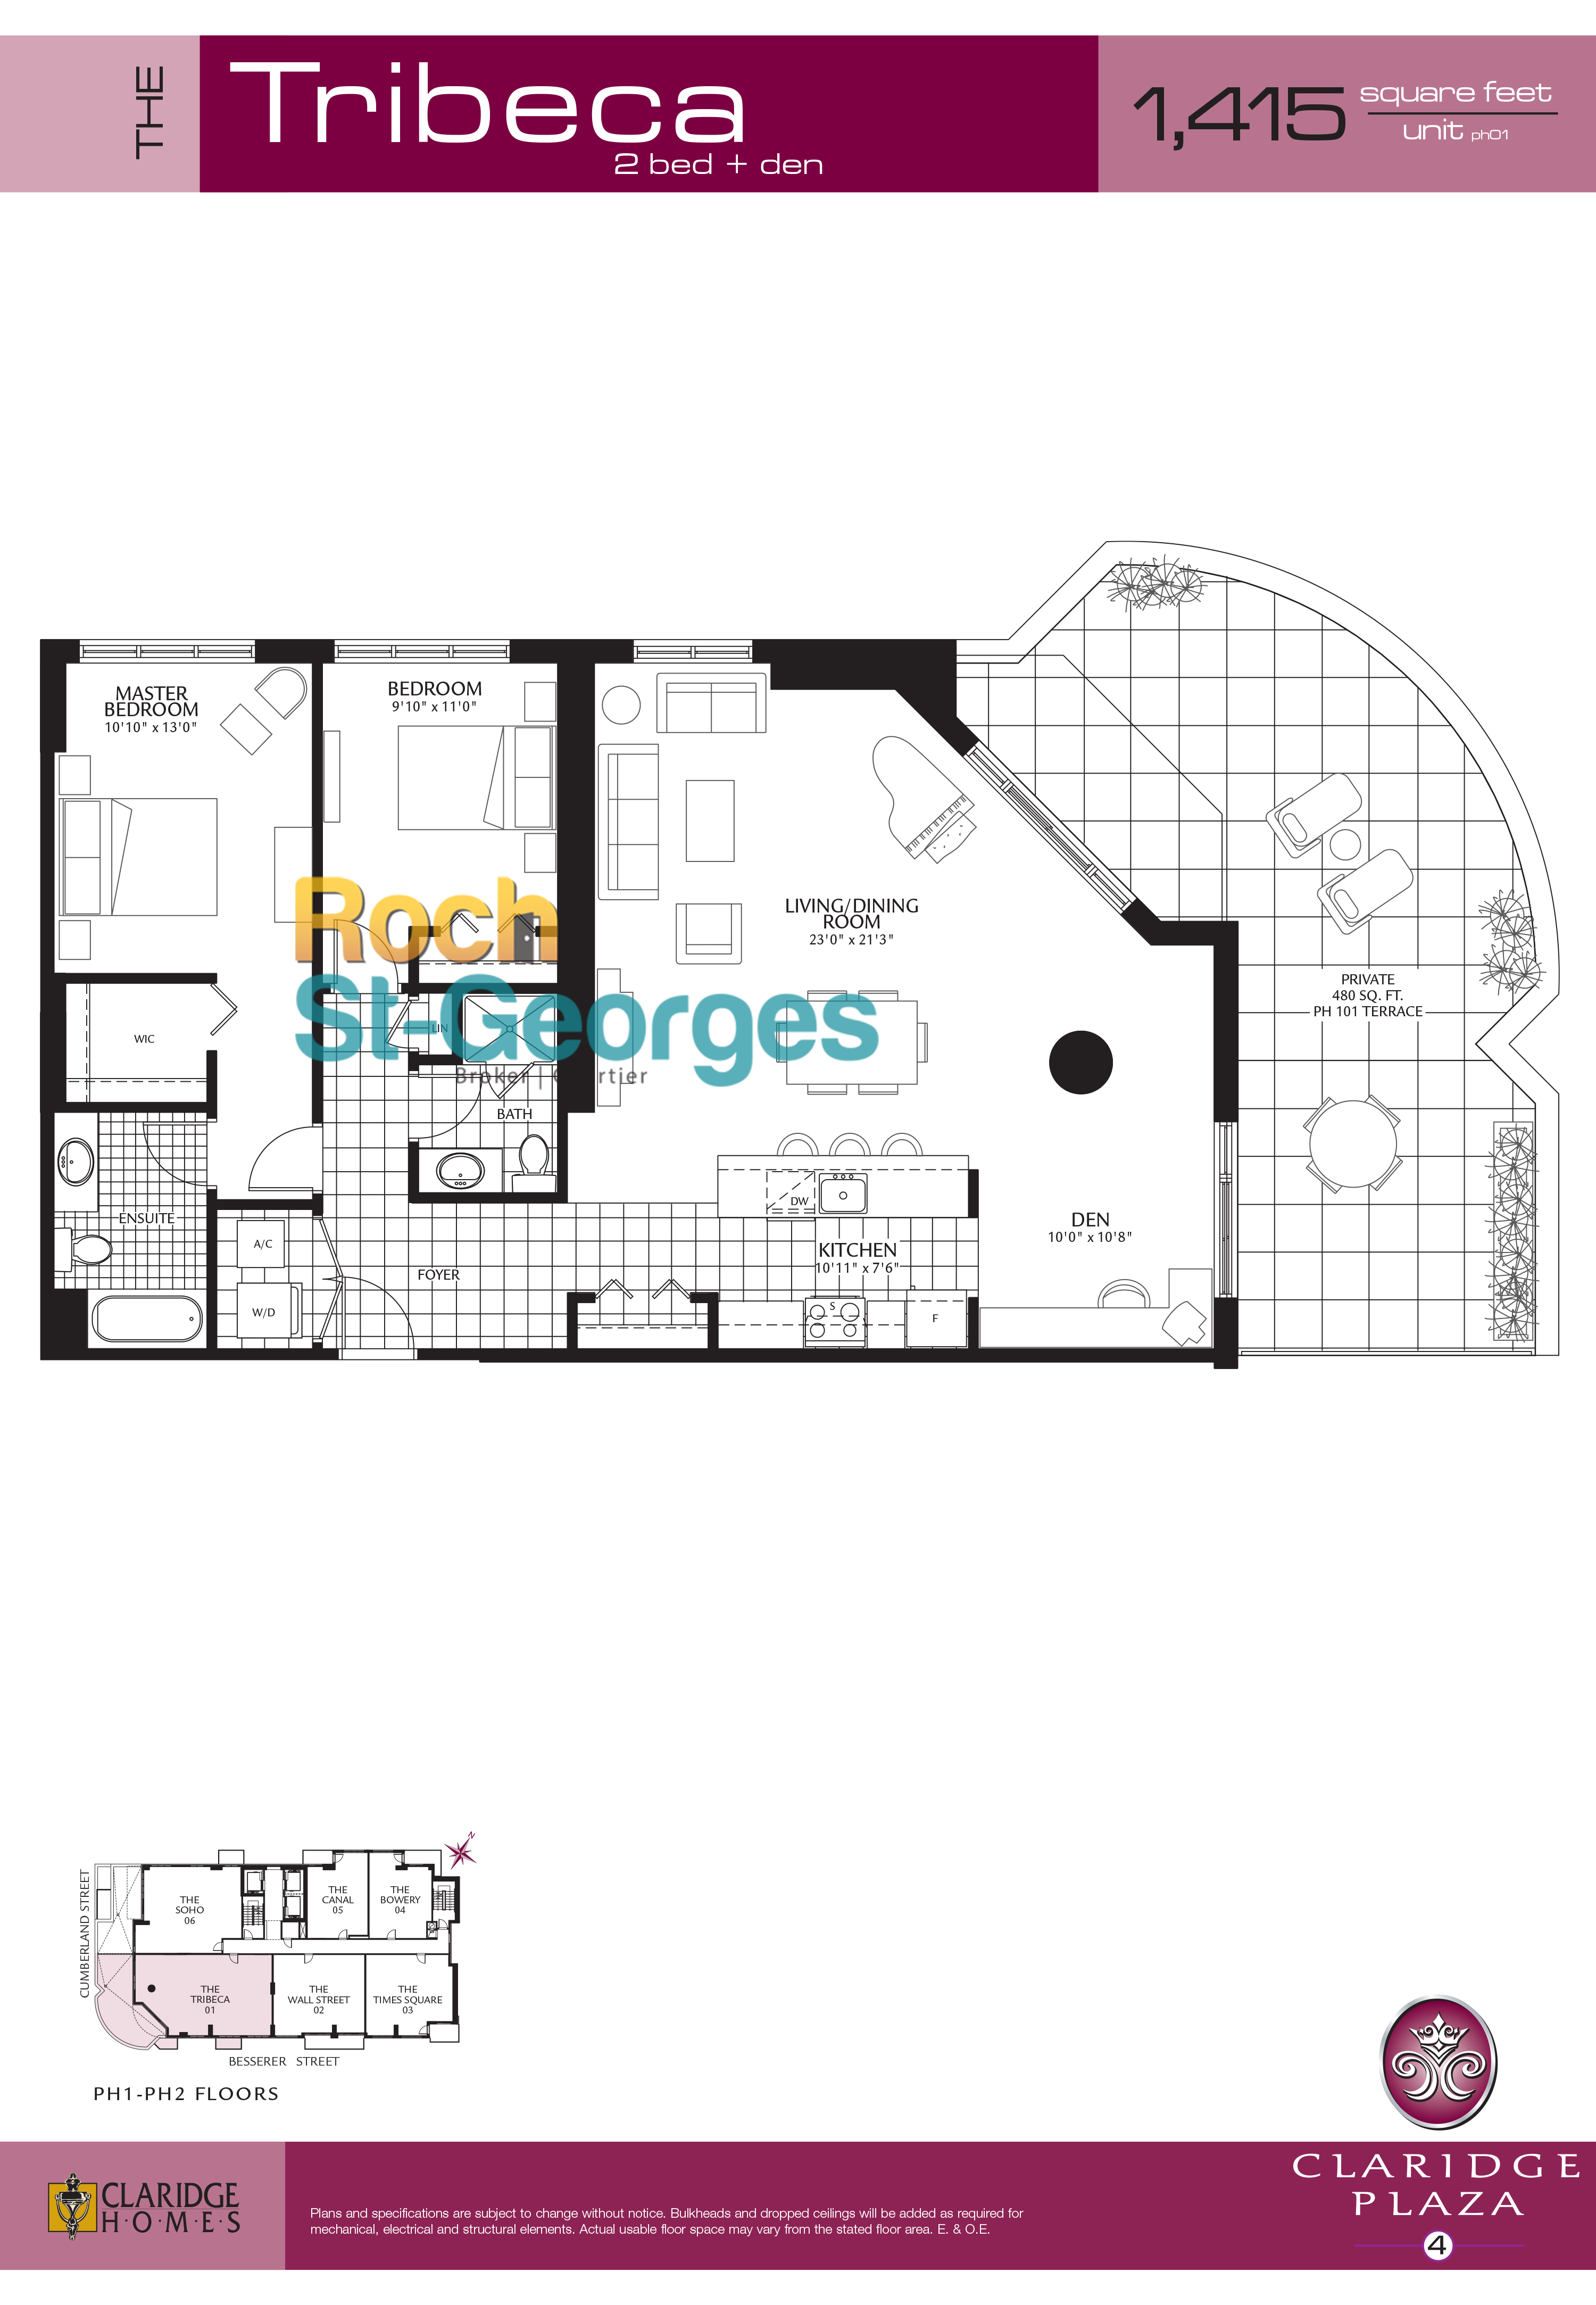 tribeca floorplan claridge